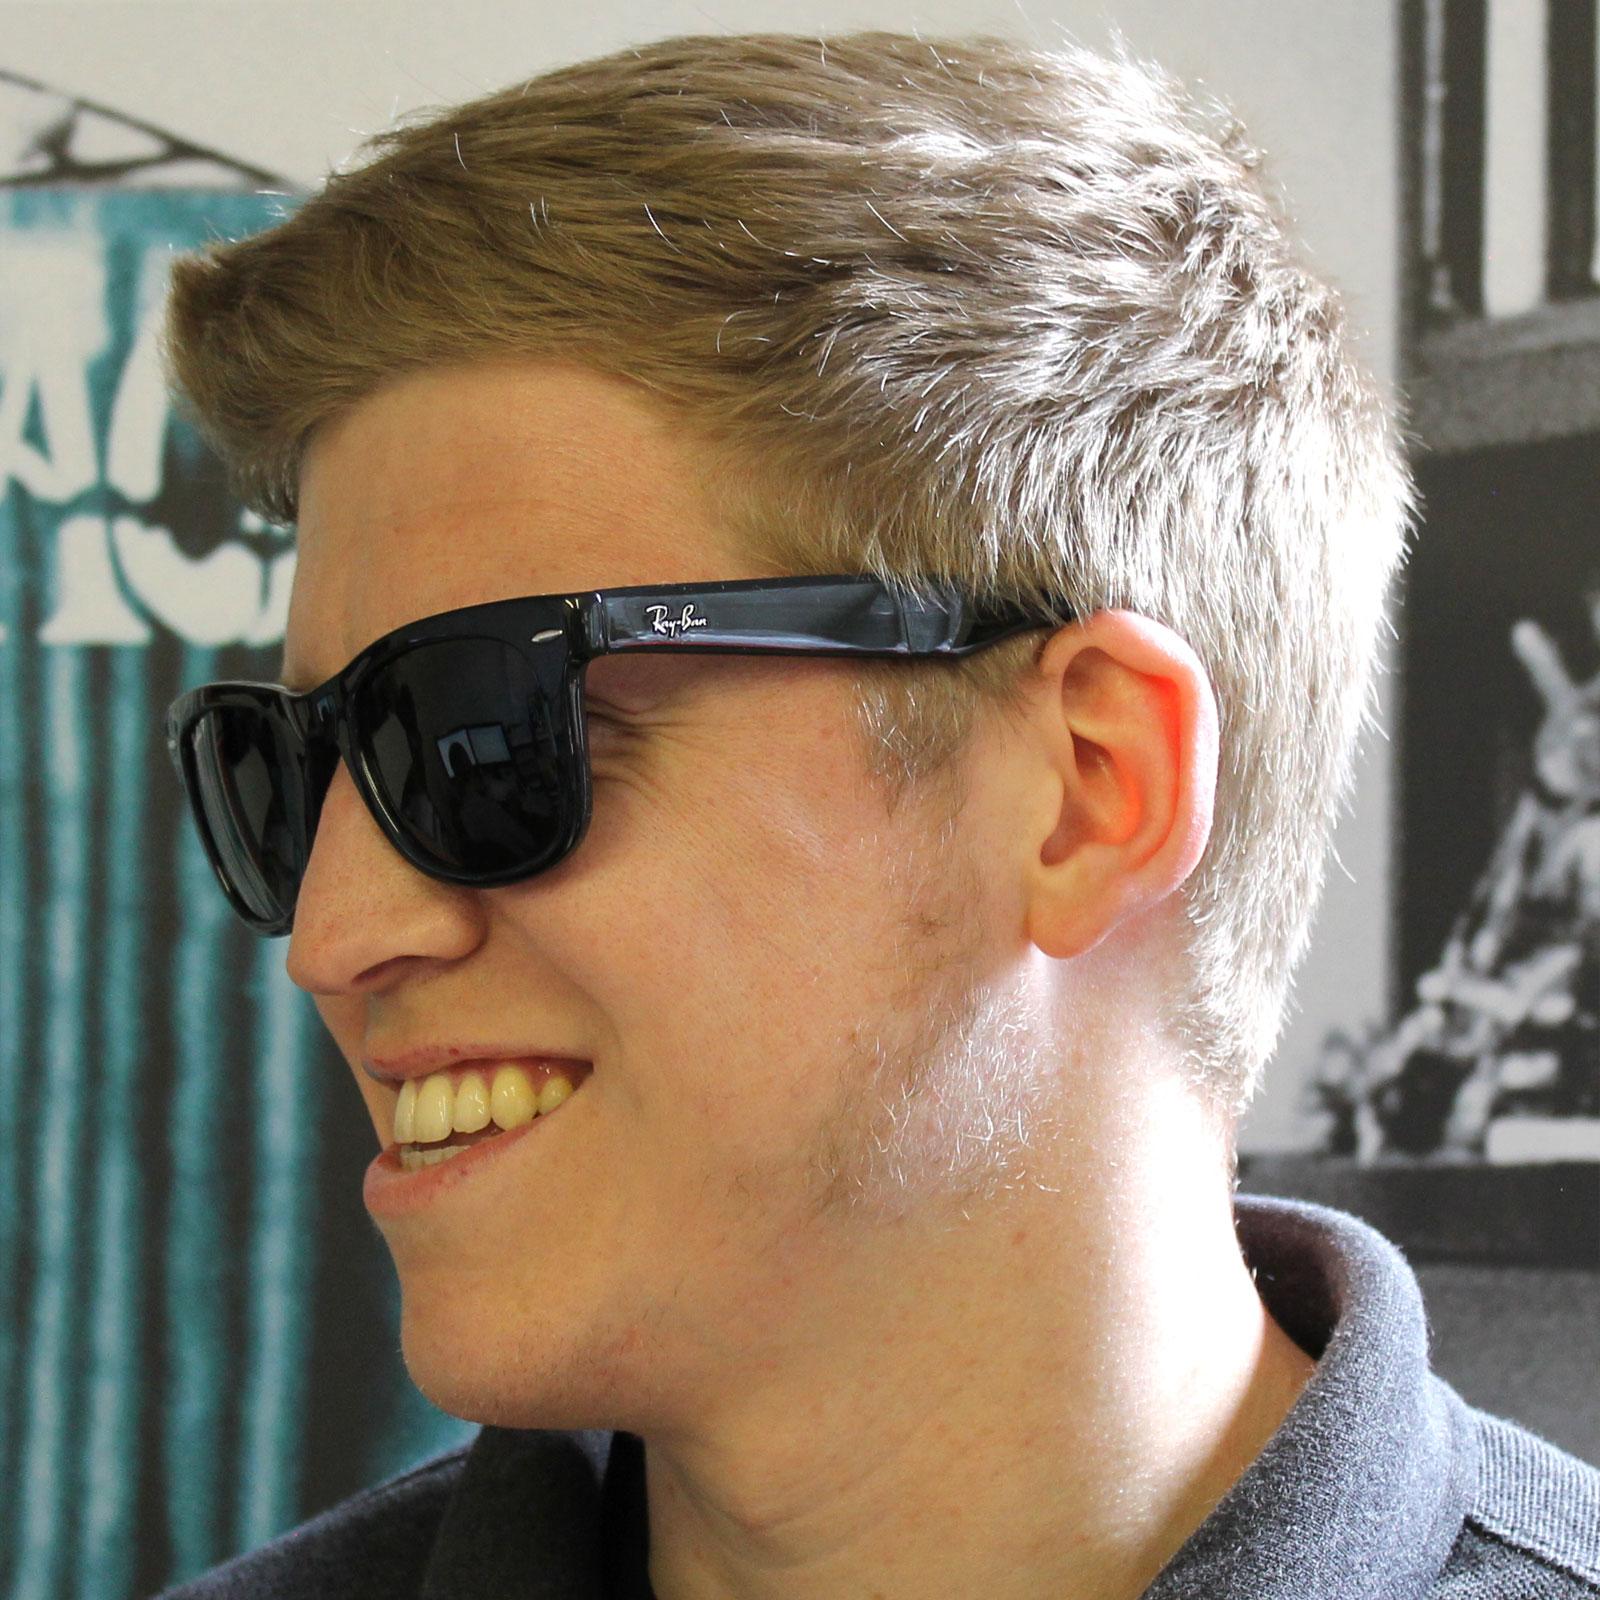 Sentinel Rayban Sunglasses Folding Wayfarer 4105 Black Green Polarized  601 58 54mm 3af60acd22a6c